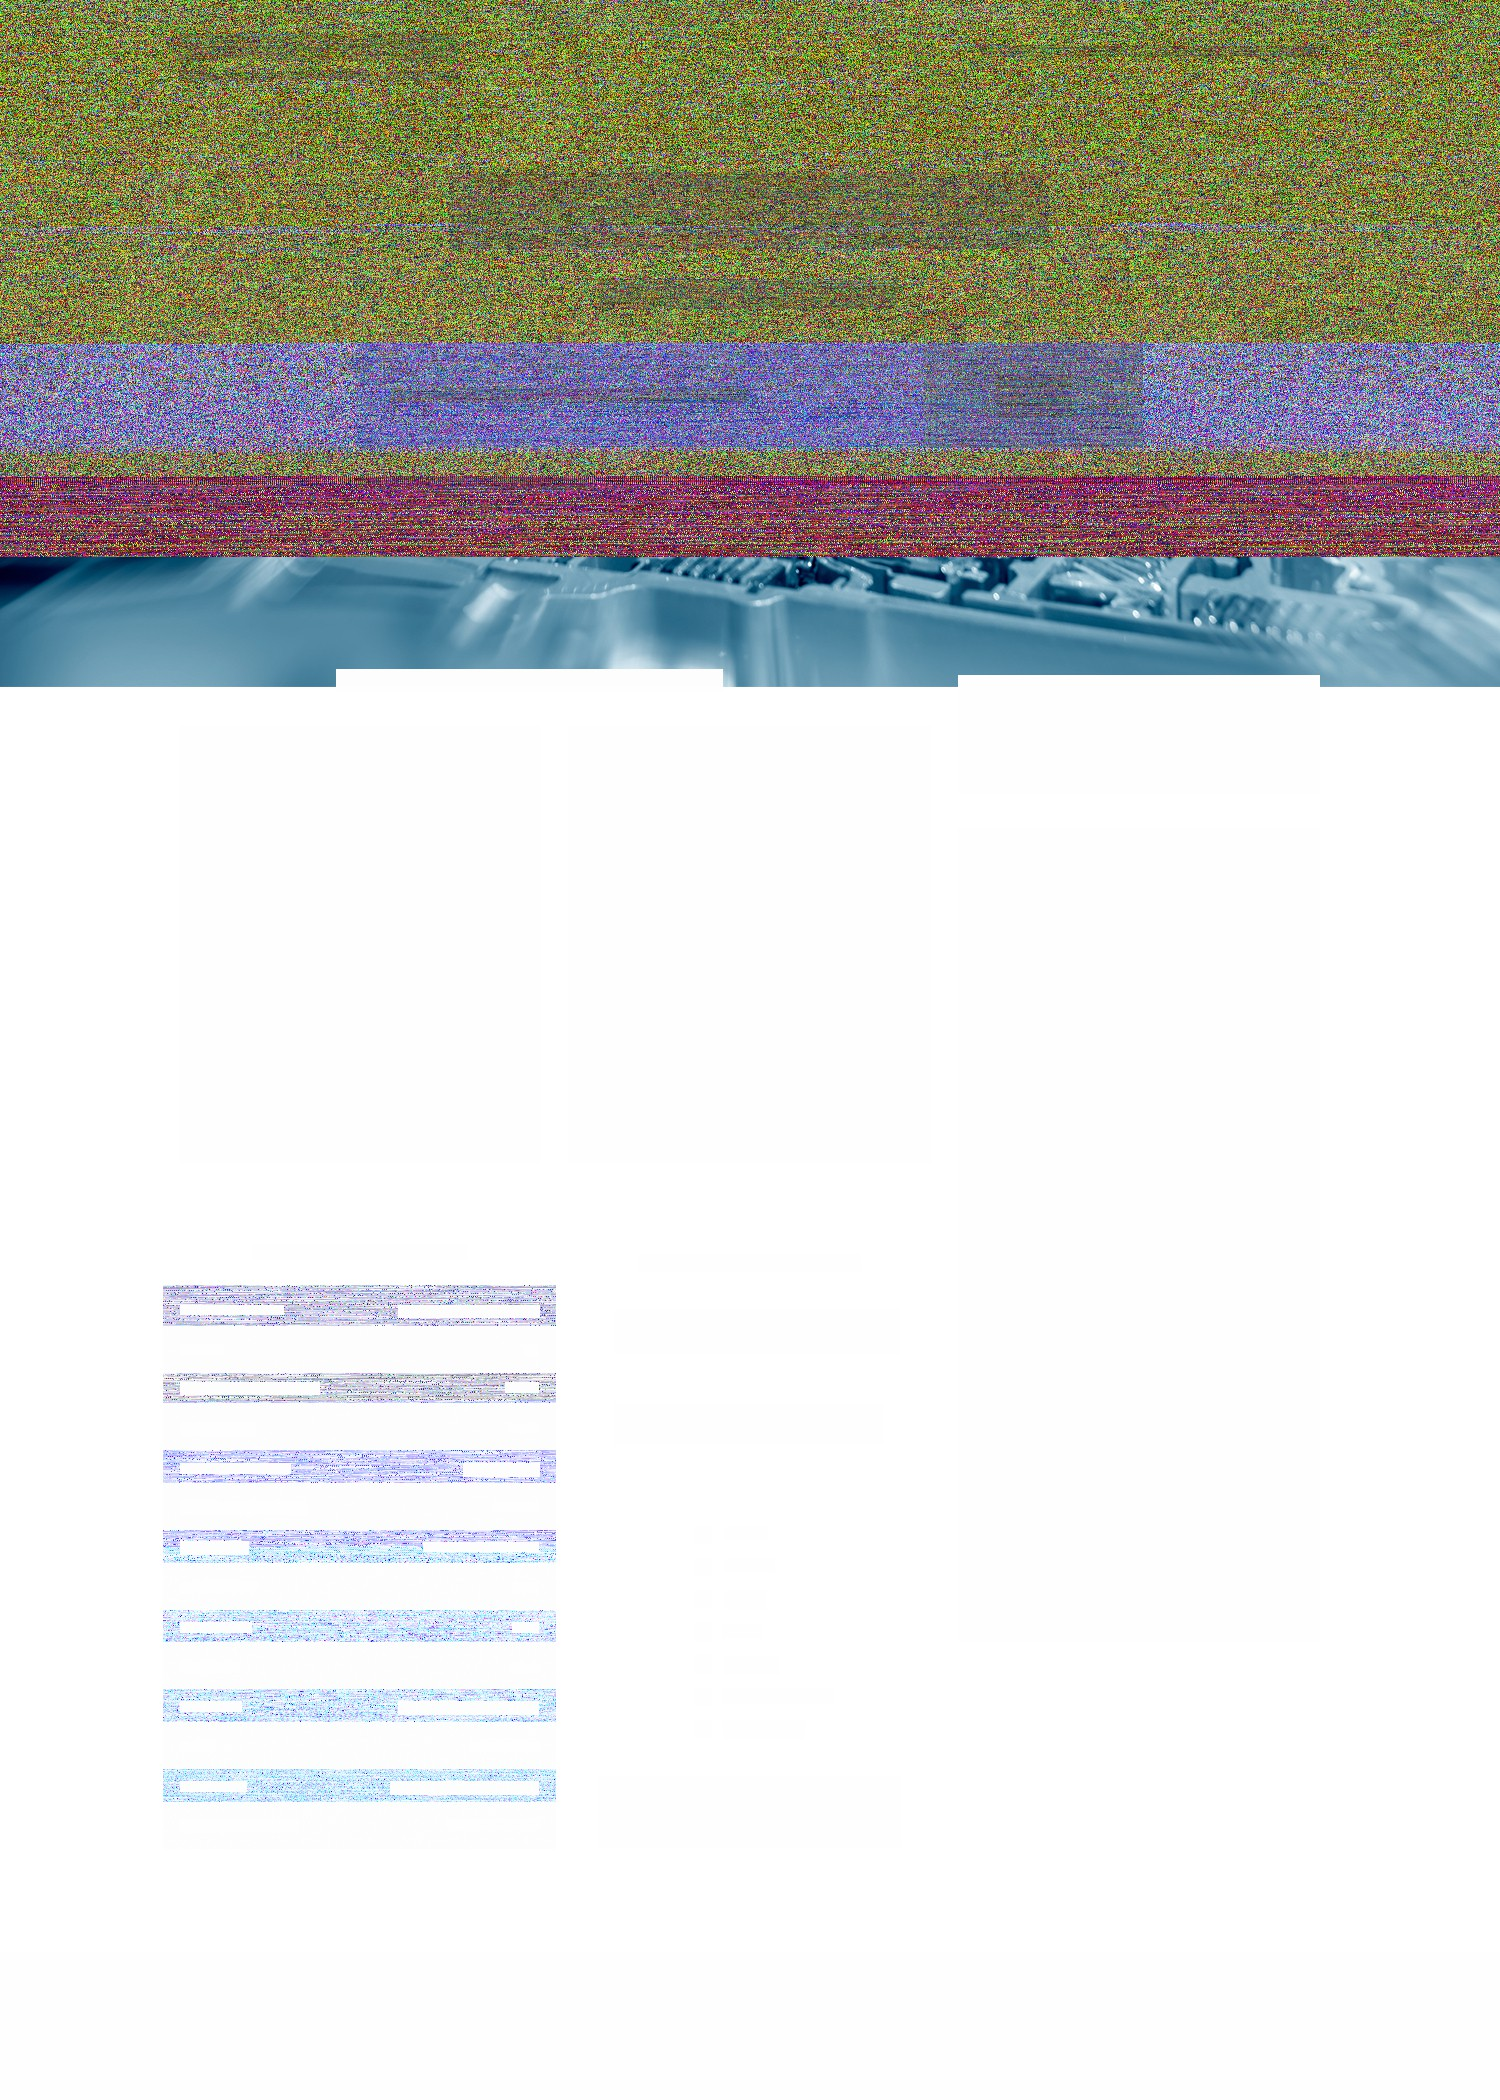 VIN Decoder Landing Page